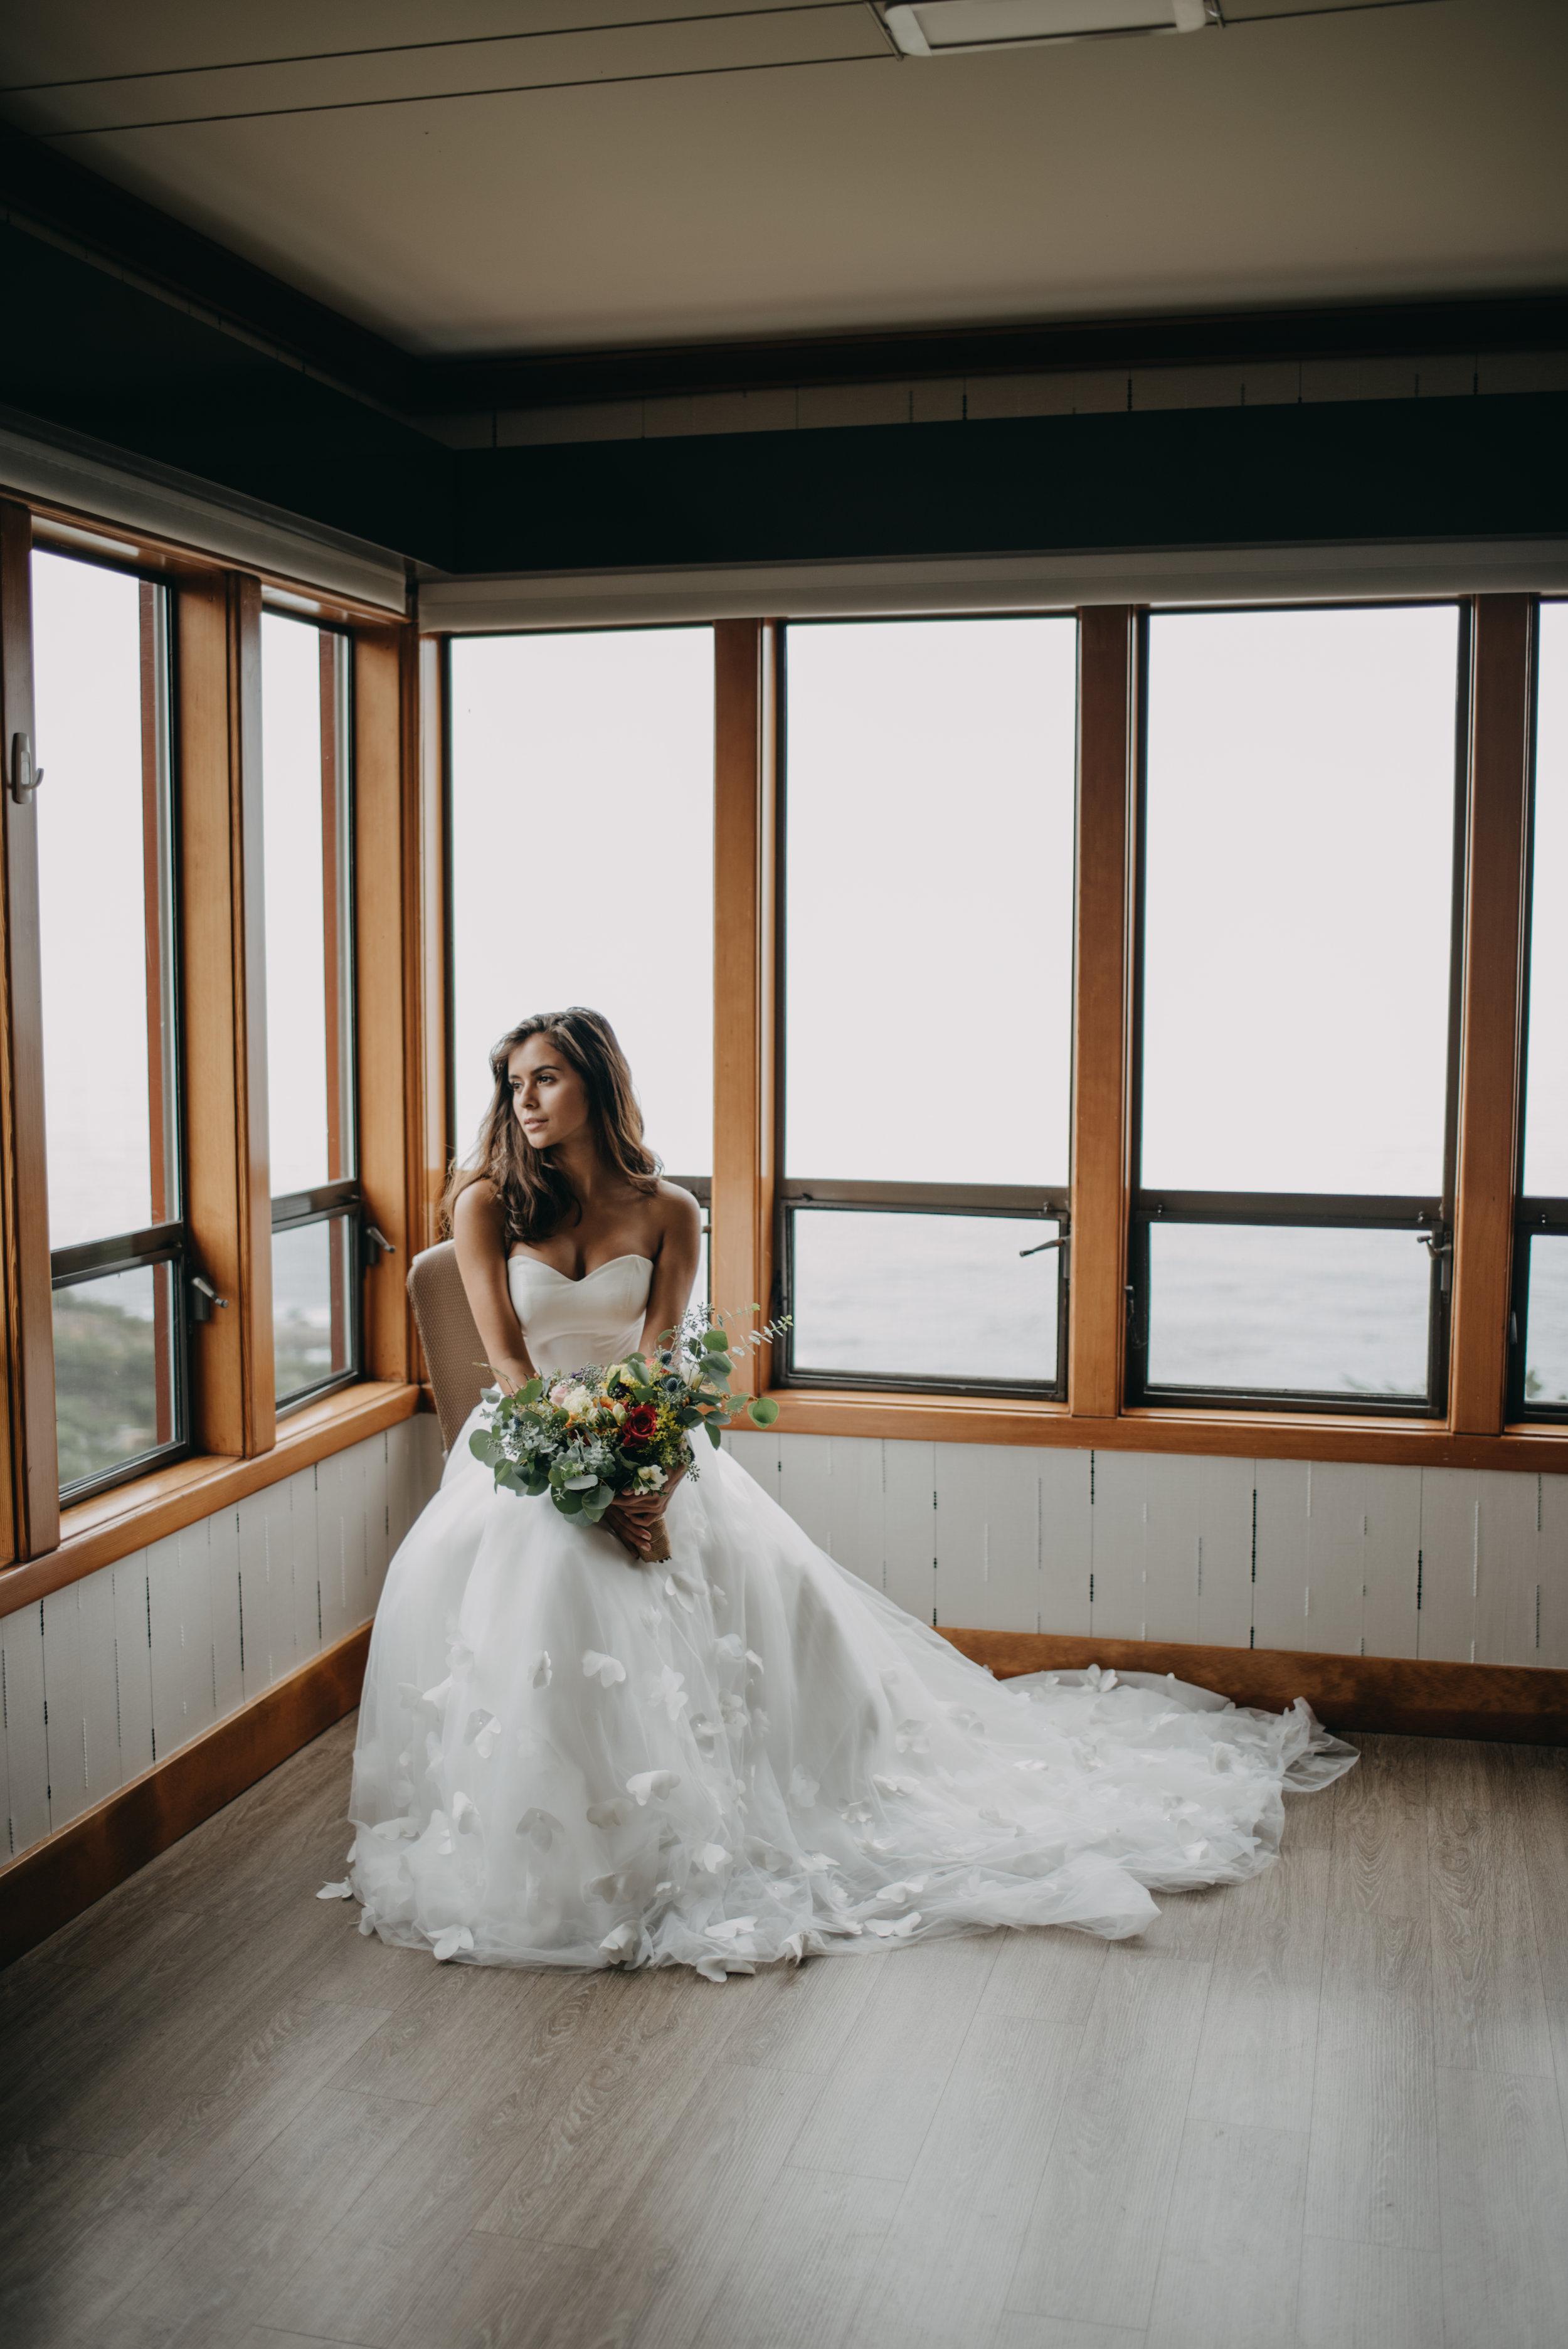 summer wedding dress strapless sweetheart neckline ballgown fit wedding dress